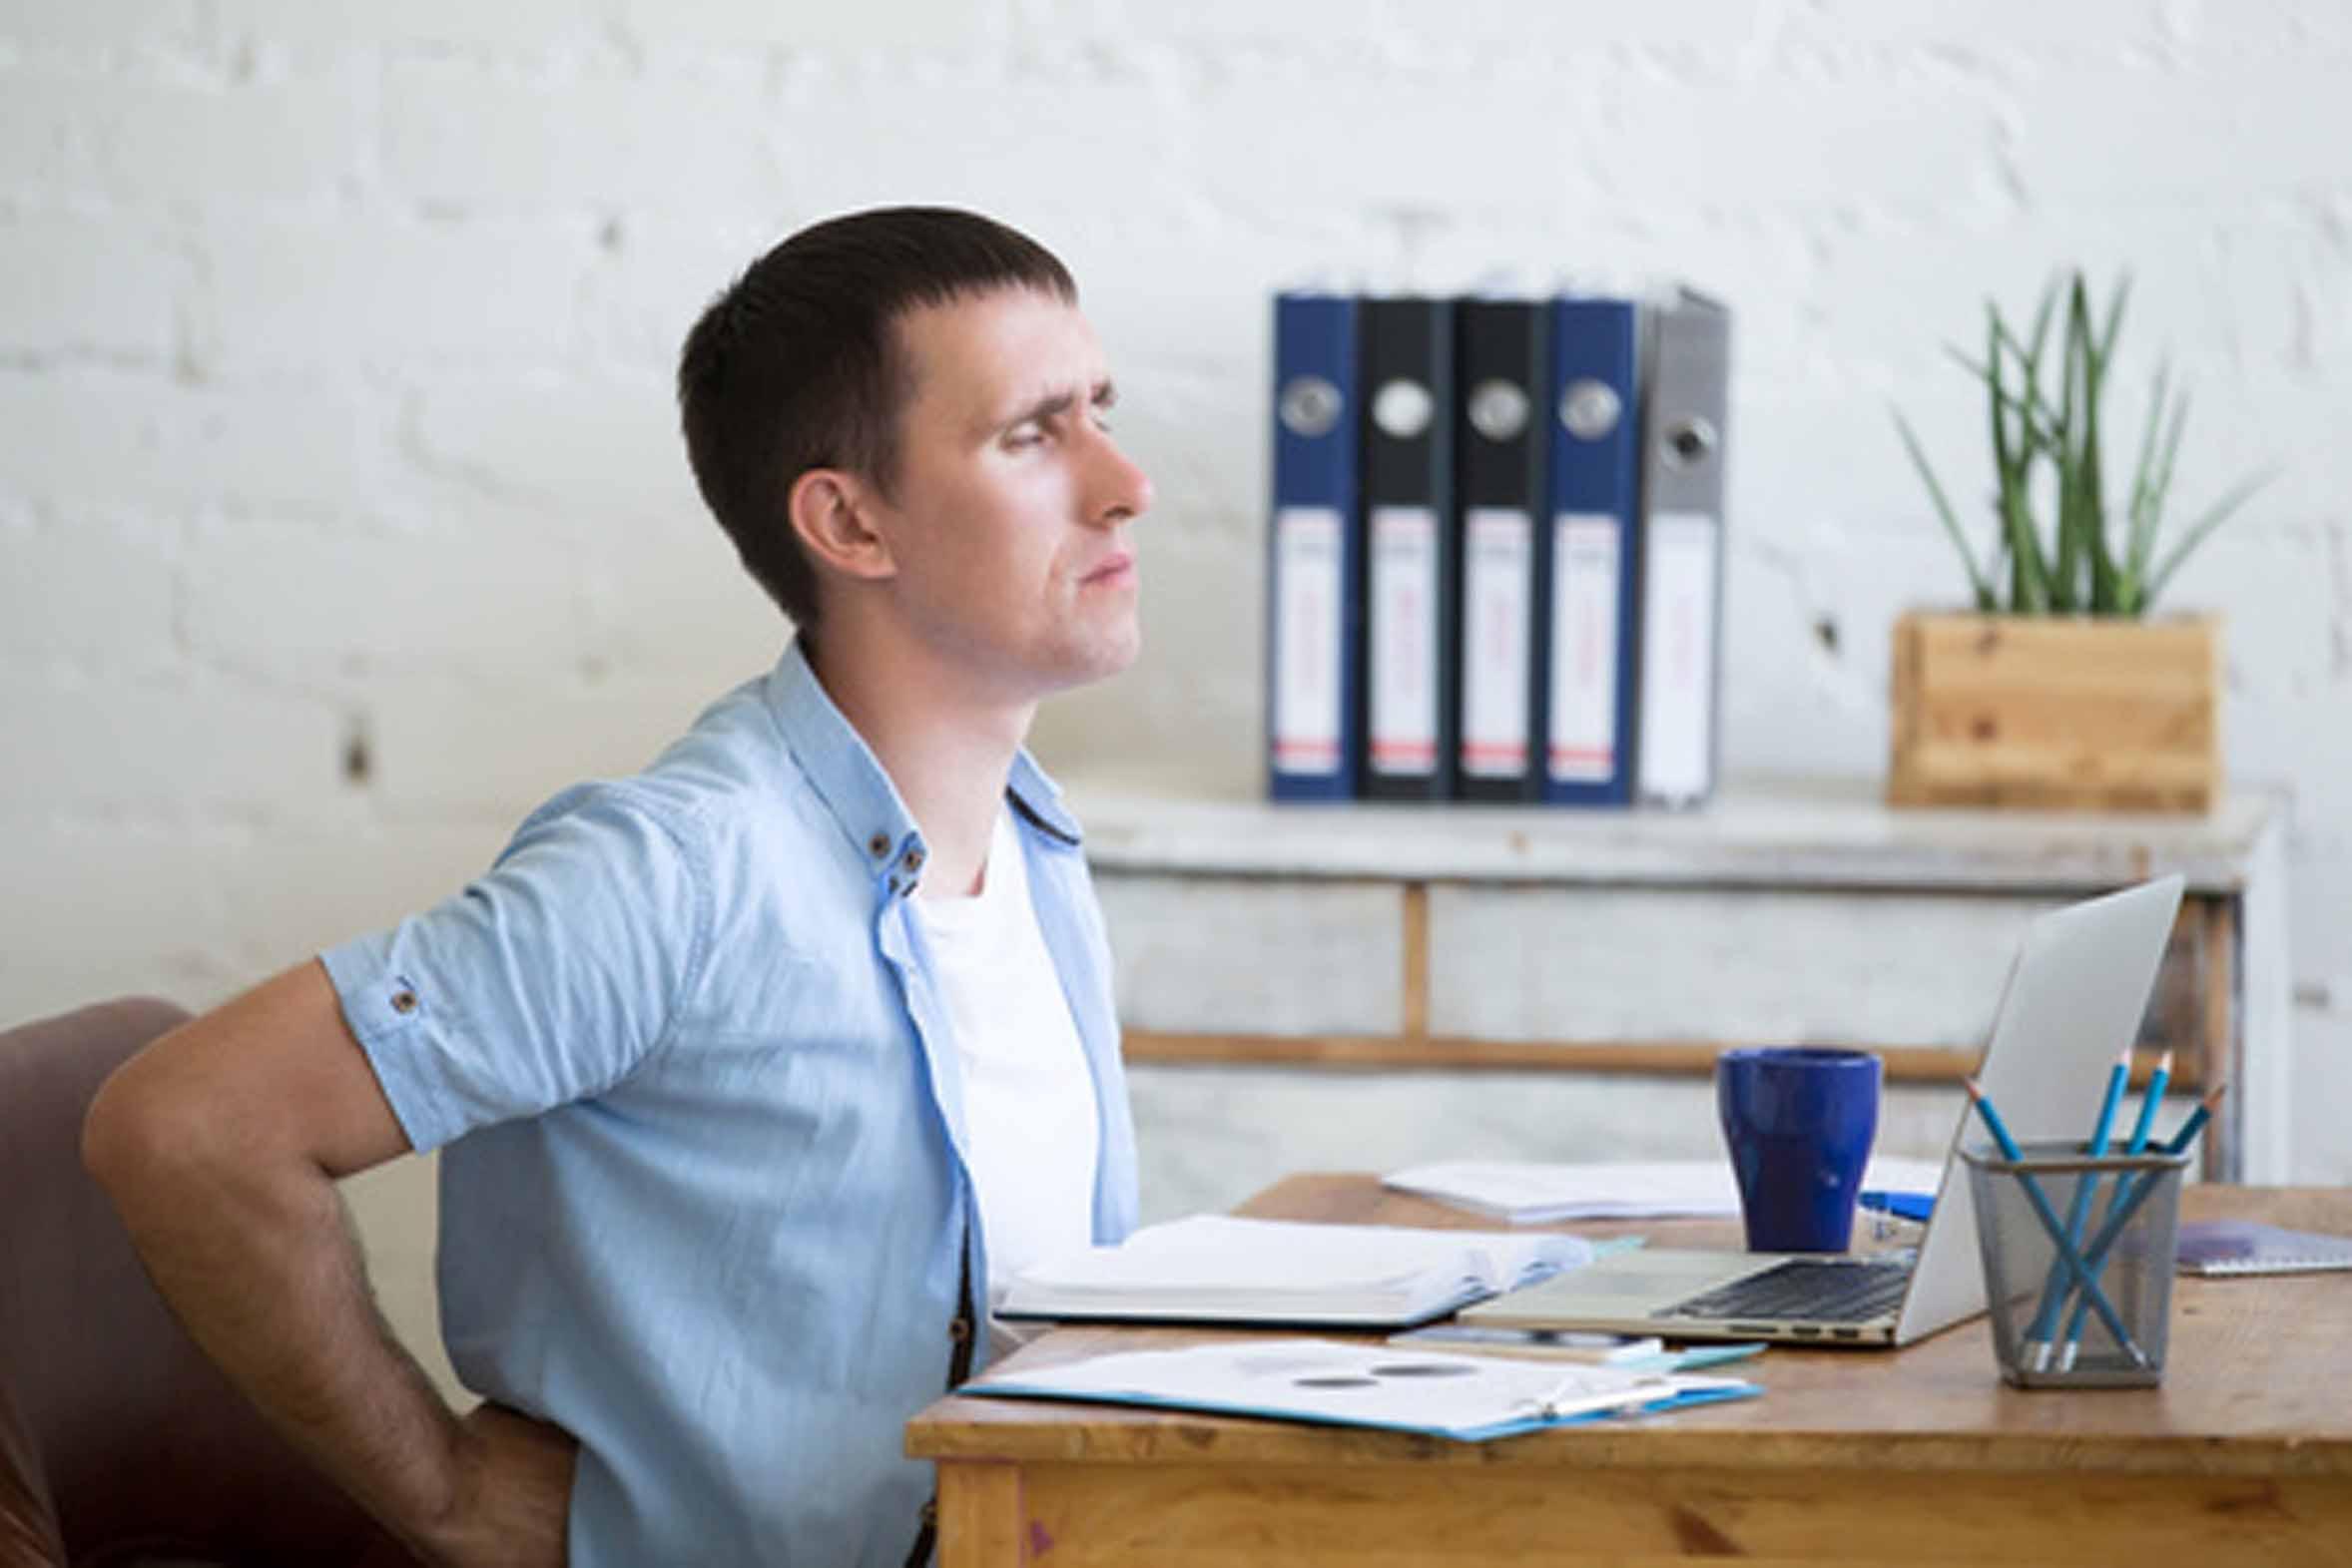 Rückenschmerzen am Schreibtisch